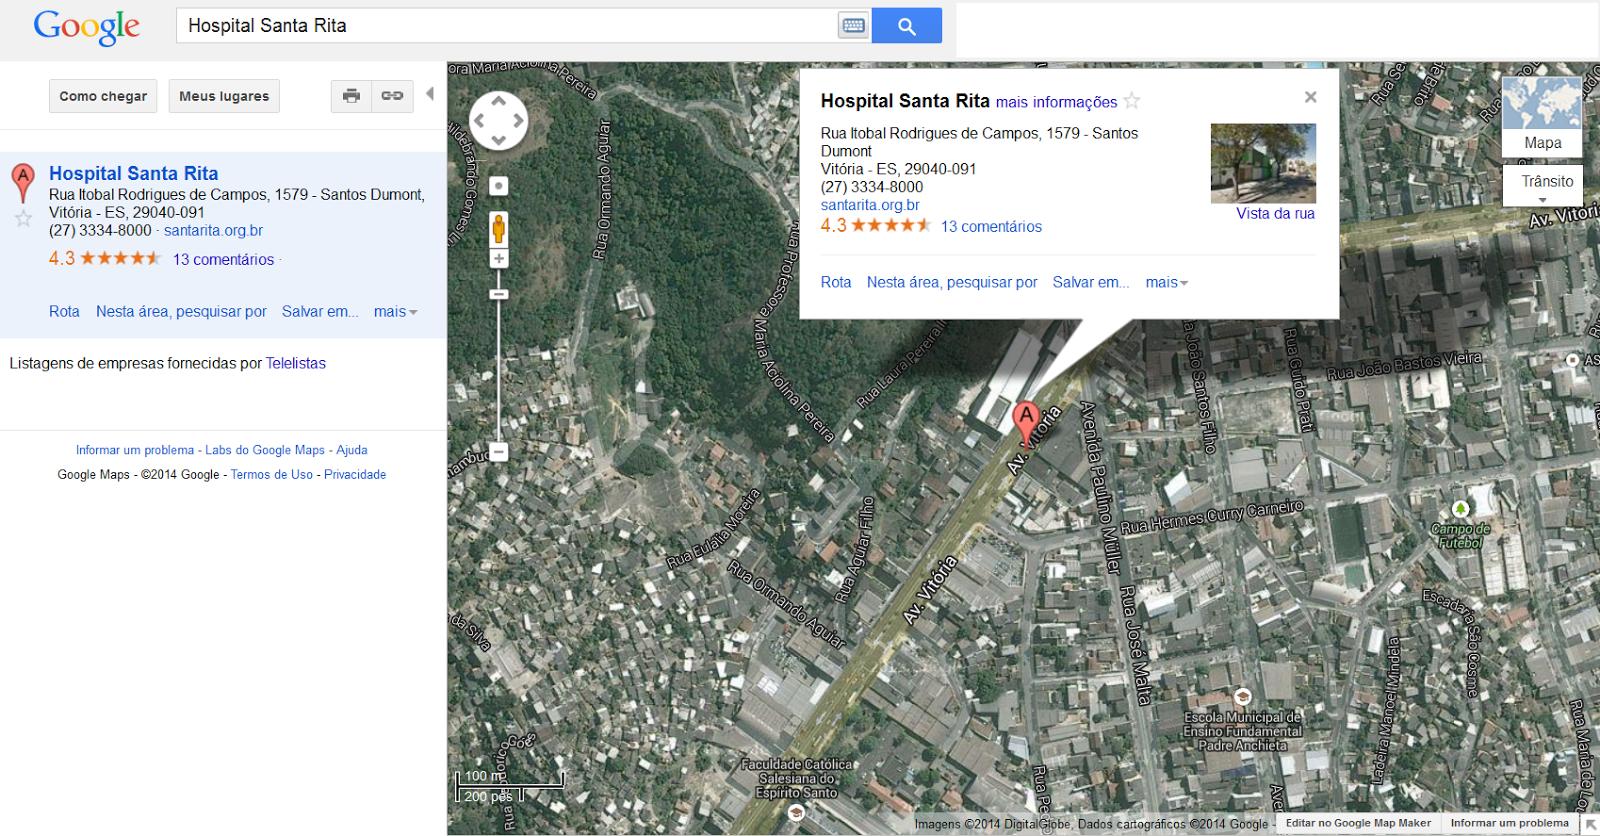 https://maps.google.com.br/maps?oe=utf-8&client=firefox-a&ie=UTF-8&q=Hospital+Santa+Rita&fb=1&gl=br&hq=hospital+santa+rita&hnear=0xb83d5d85374ee9:0x97595e7ea70ed809,Vit%C3%B3ria+-+ES&cid=9363191092163106538&ei=KDfwUpy9O4XskQeO-IHADA&ved=0CJYBEPwSMAs